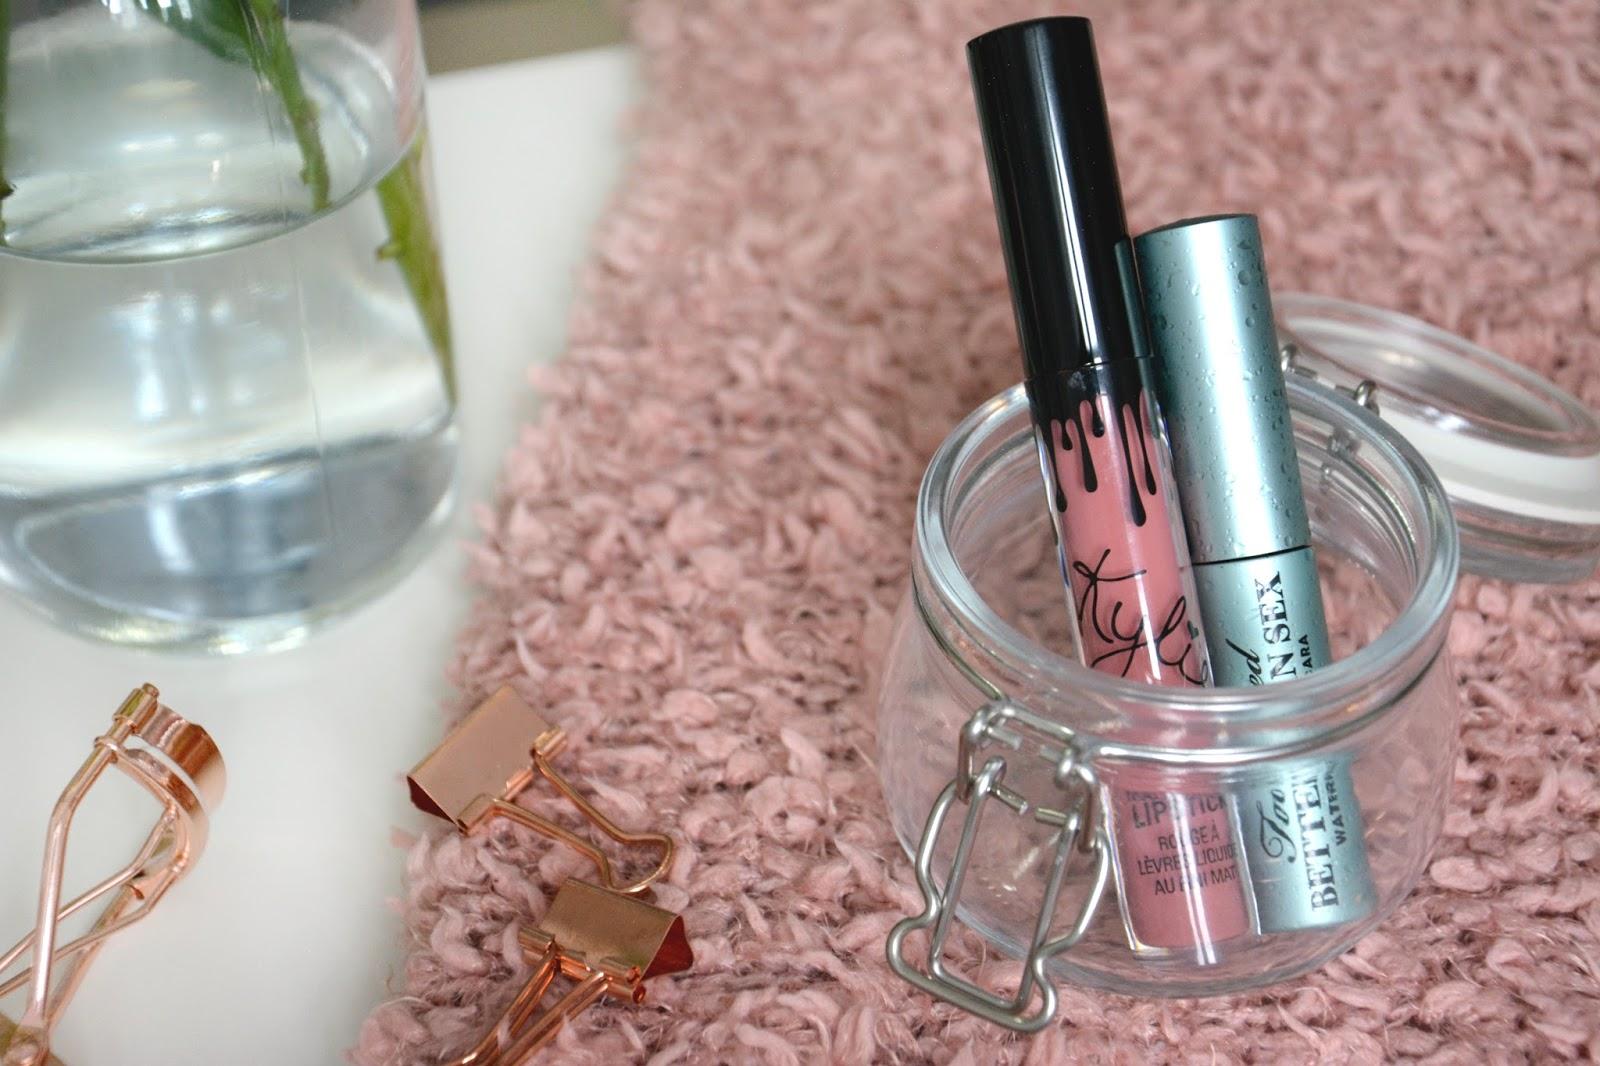 Kylie Cosmetics Matte Liquid Lipstick Candy K; Too Faced Better Than Sex Waterproof Mascara; Primark Rose Gold Eyelash Curler